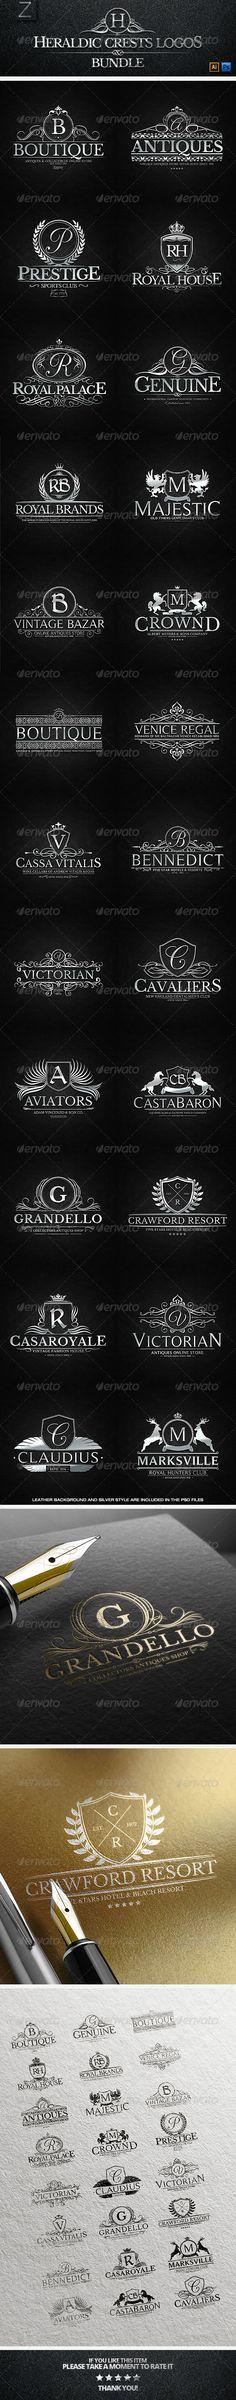 24 Heraldic Crest Logos Bundle - Badges & Stickers Web Elements